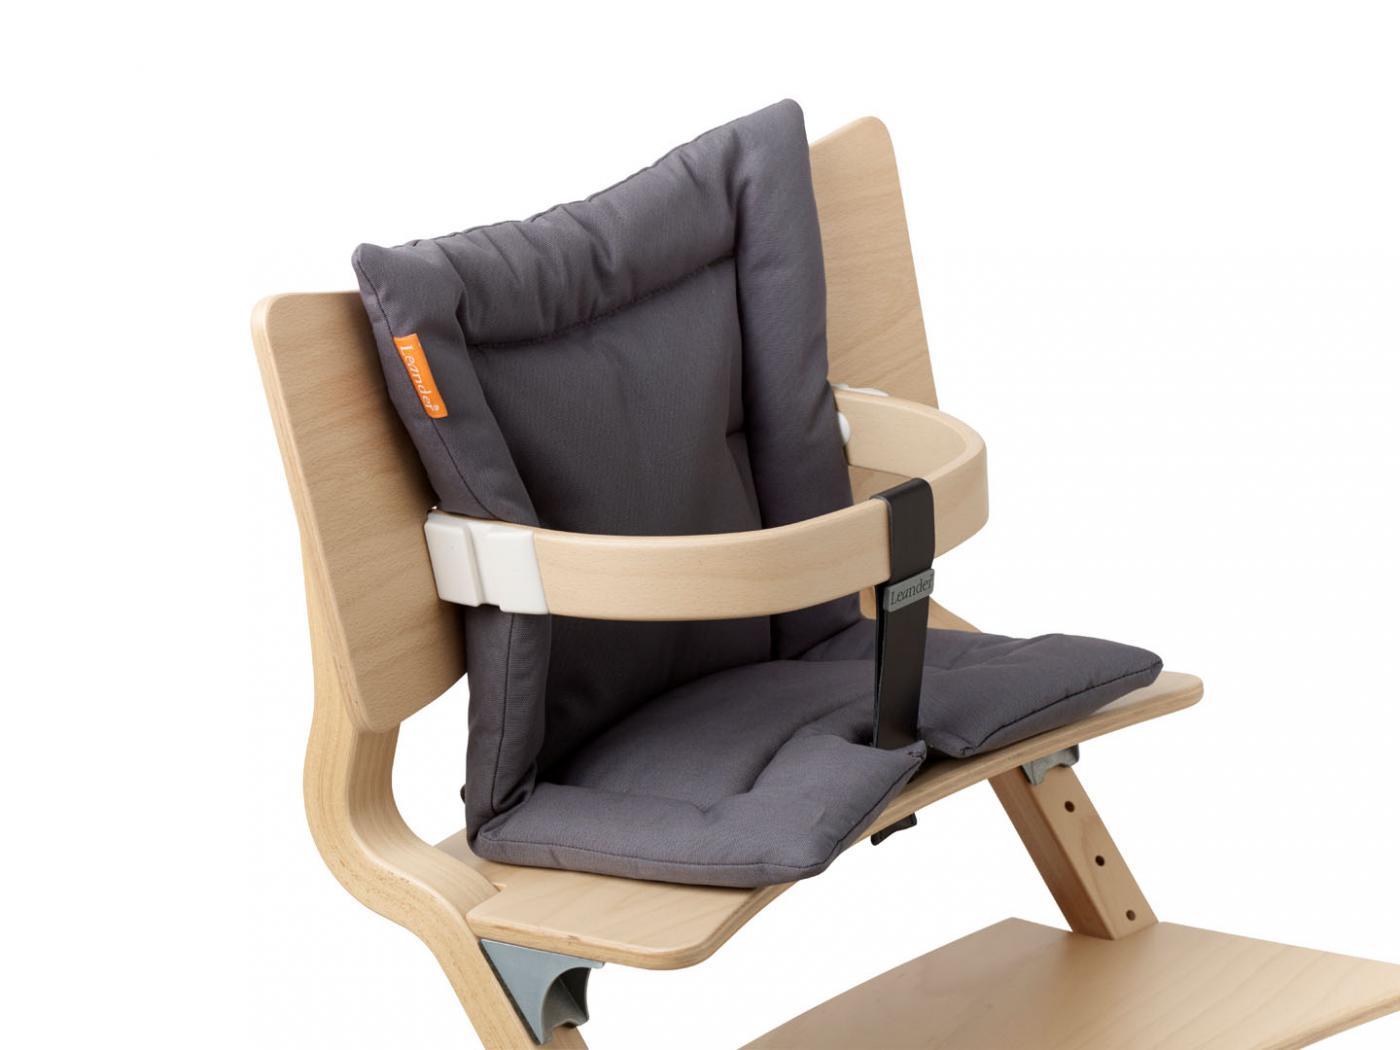 Leander coussin gris anthracite pour chaise haute - Coussin pour chaise haute en bois ...